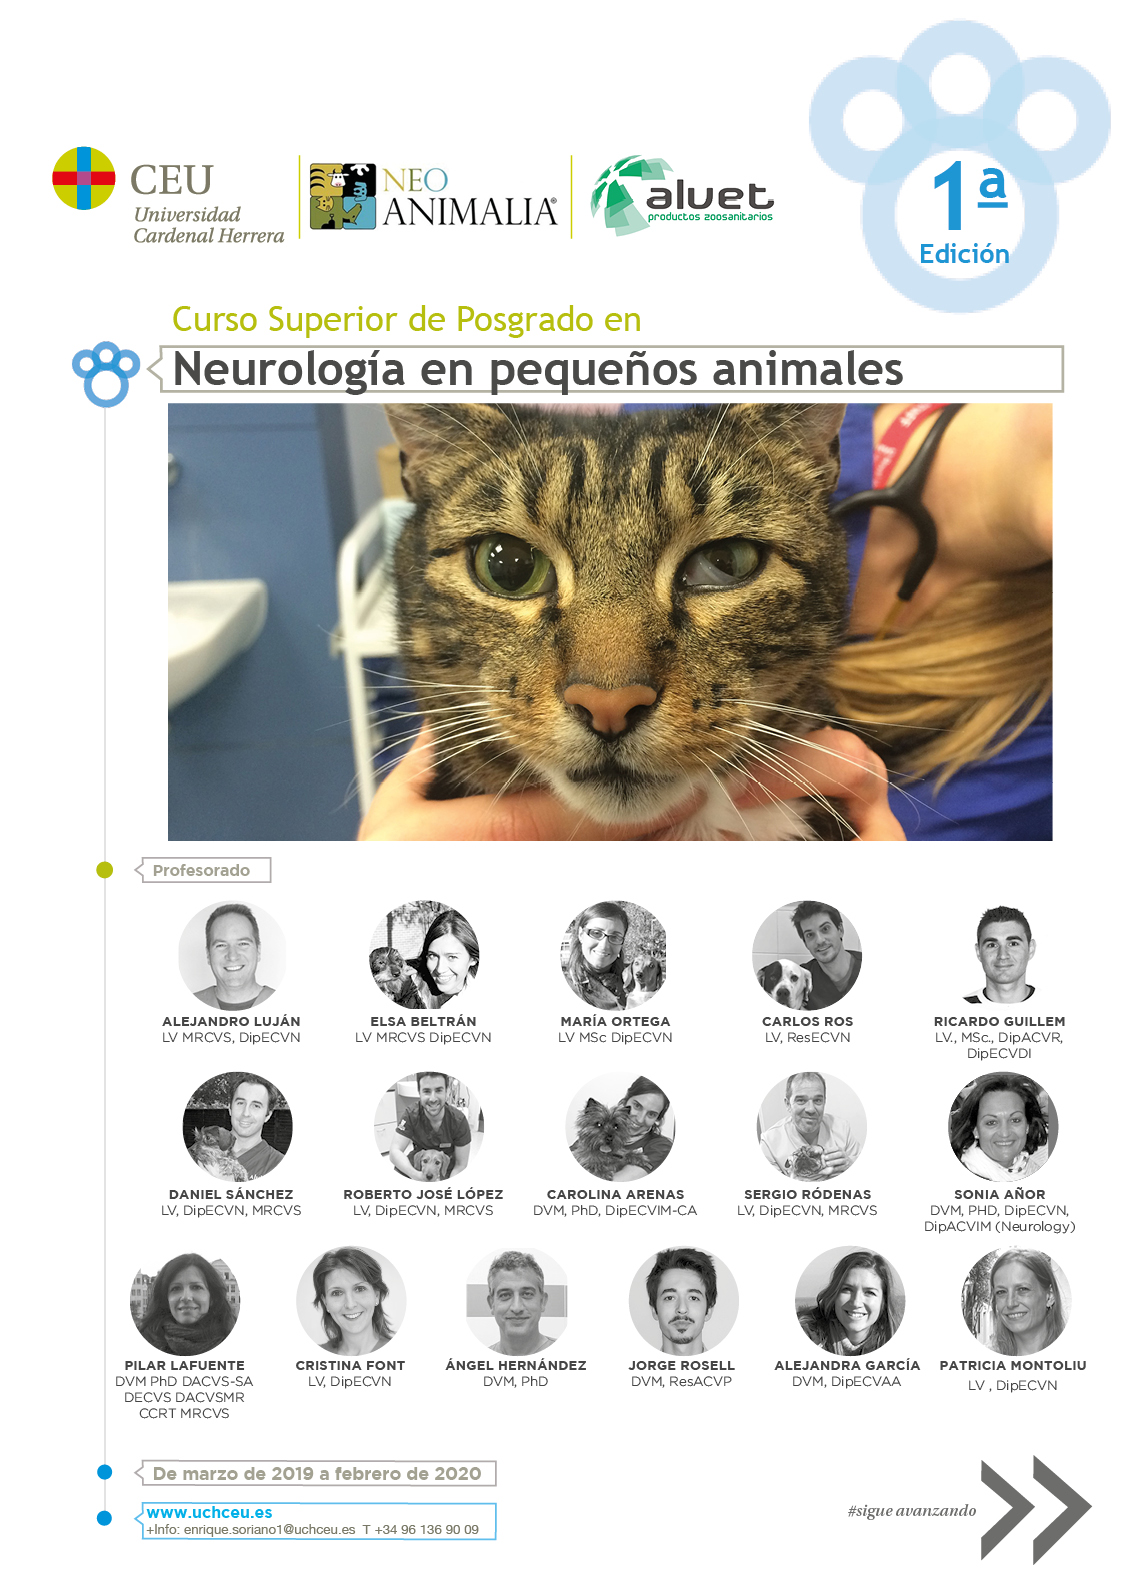 Curso Superior De Posgrado En Neurologia En Pequeños